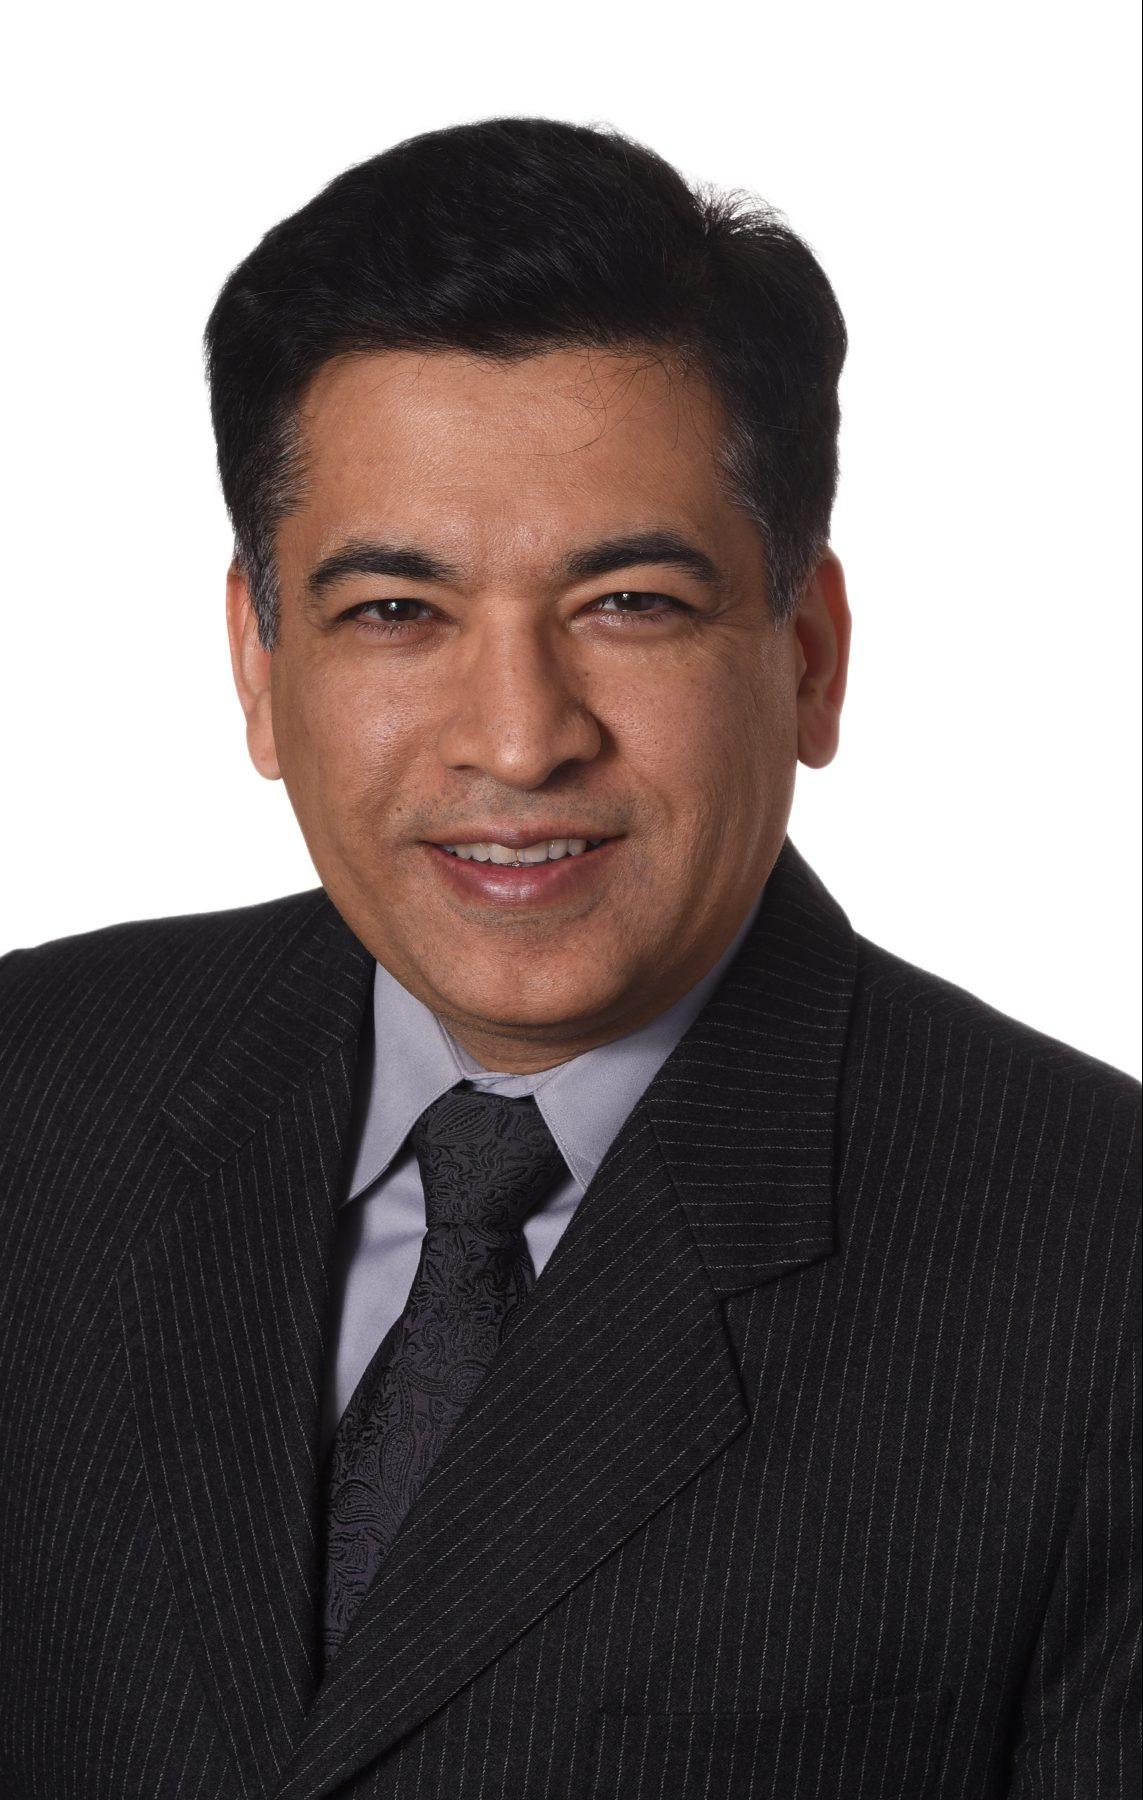 Image of Dr. Ajay Israni